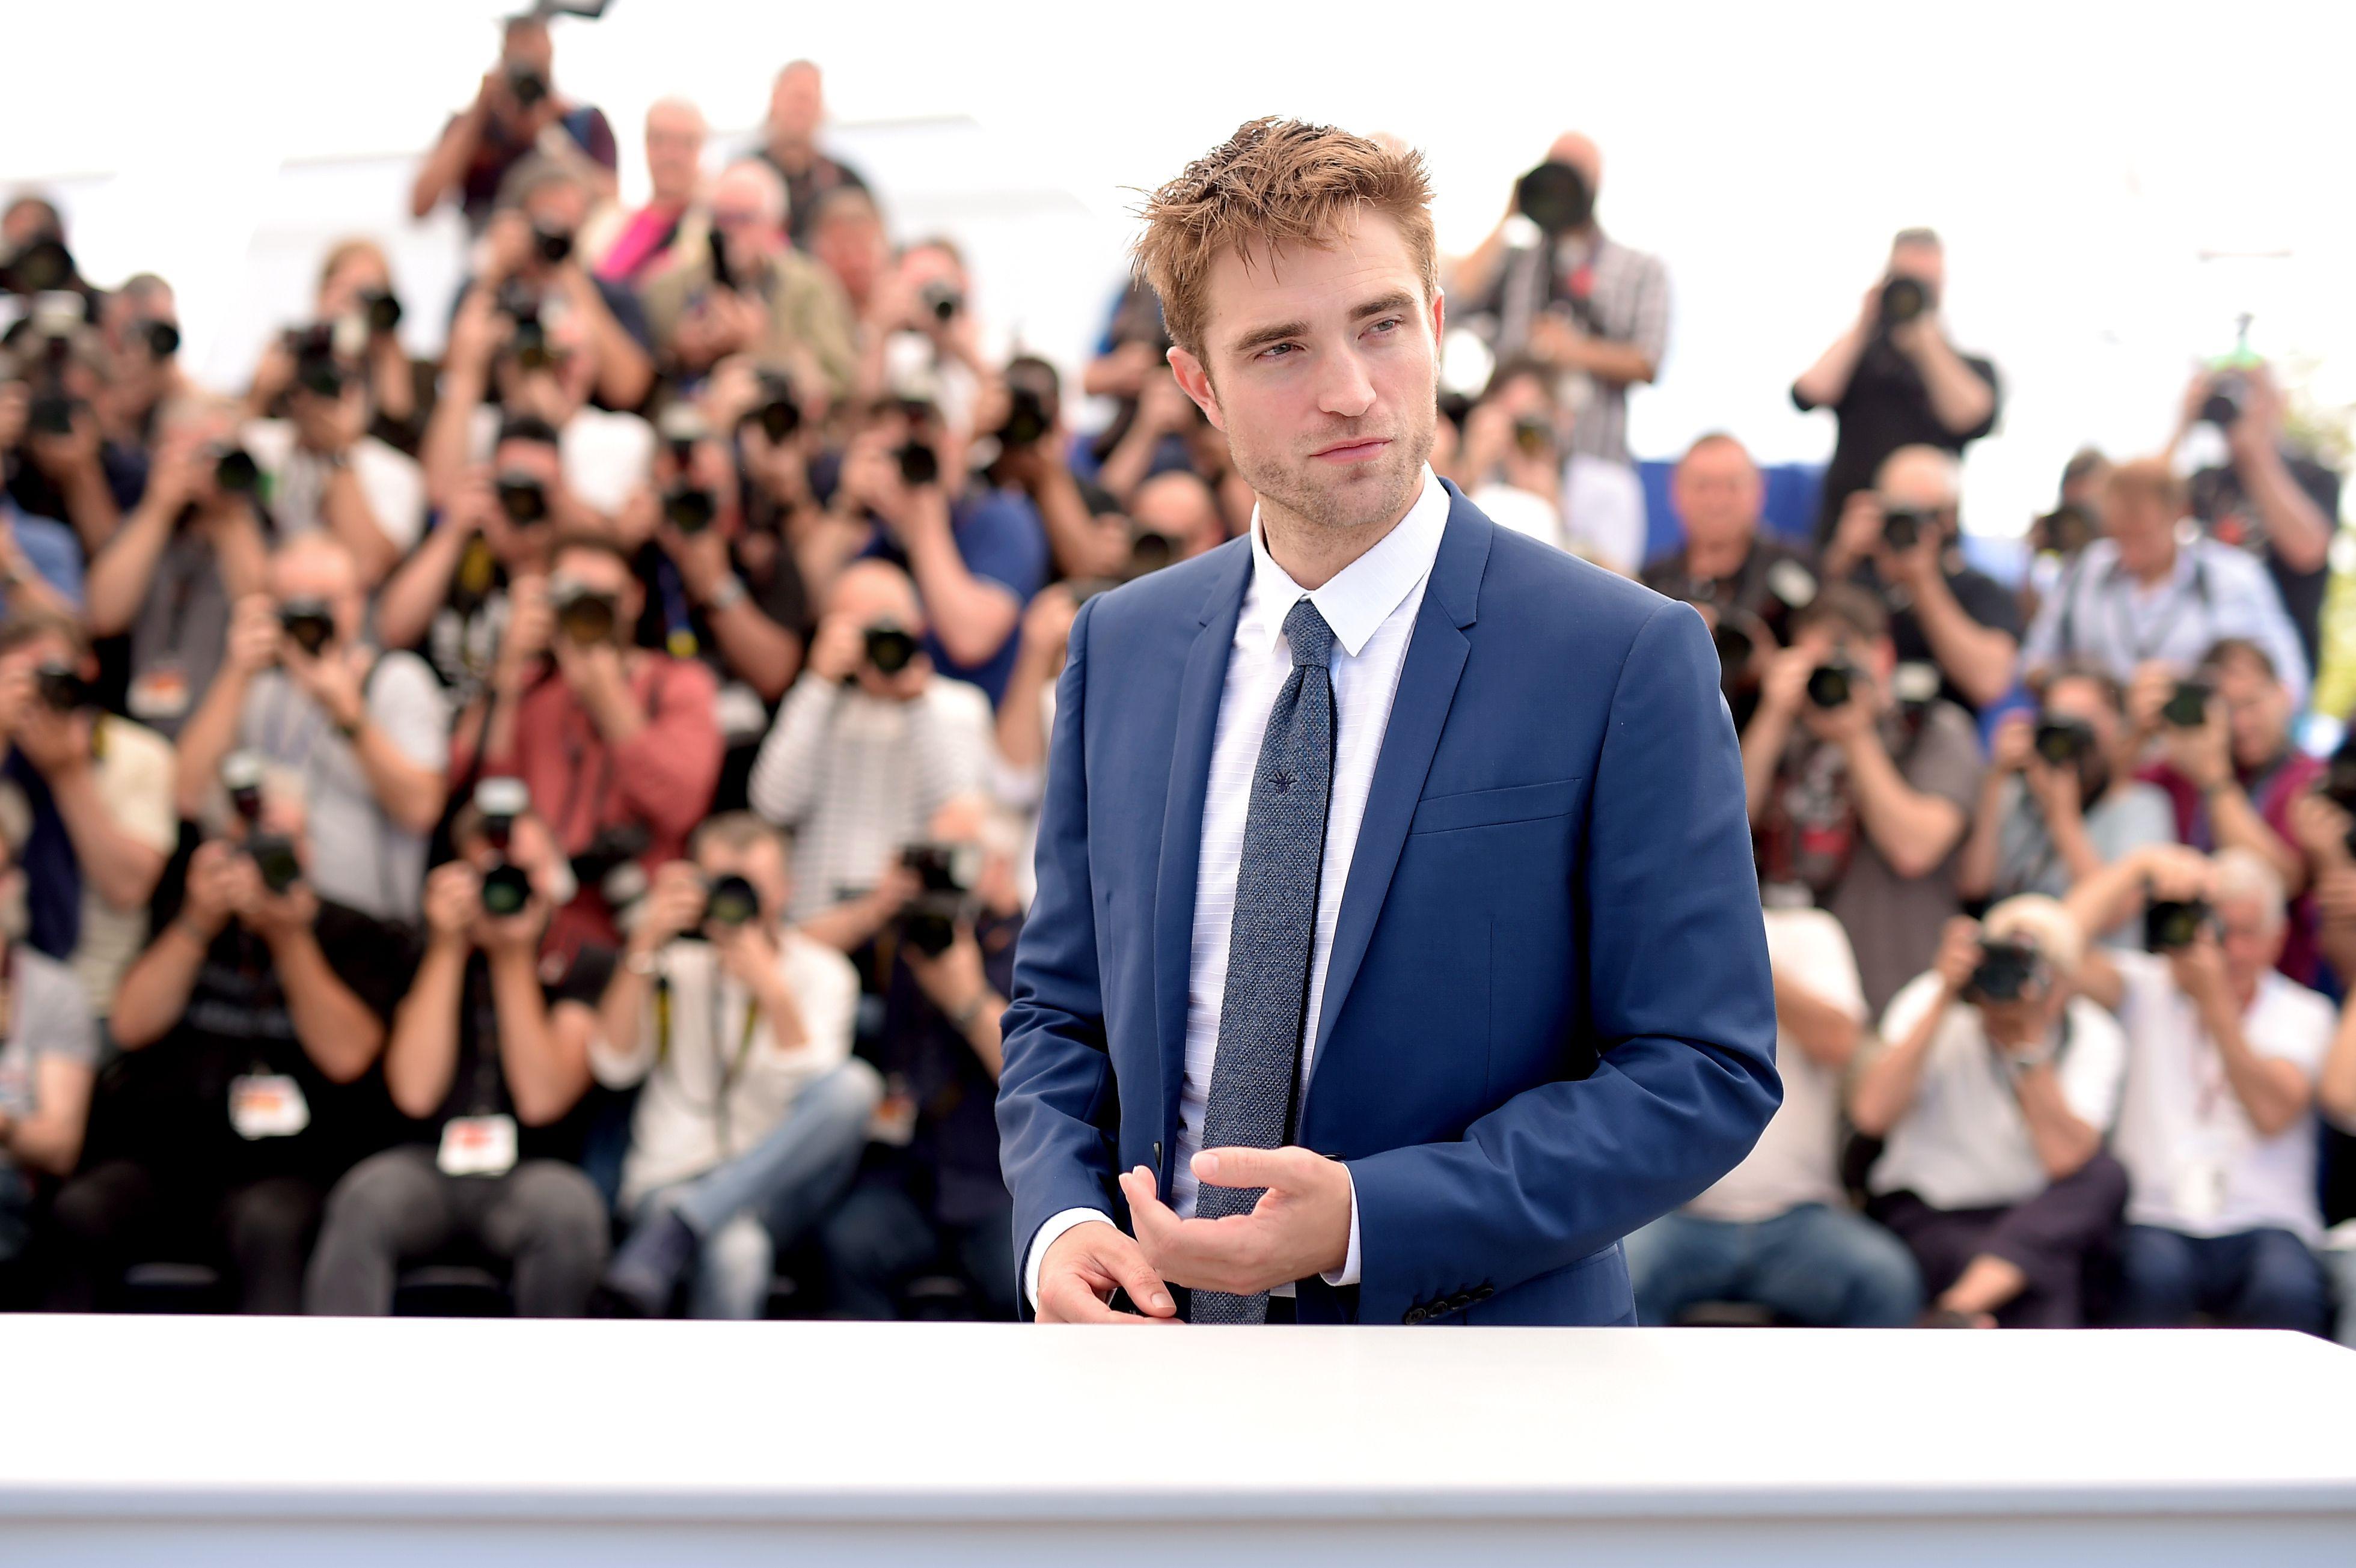 Robert Pattinson at a film festival